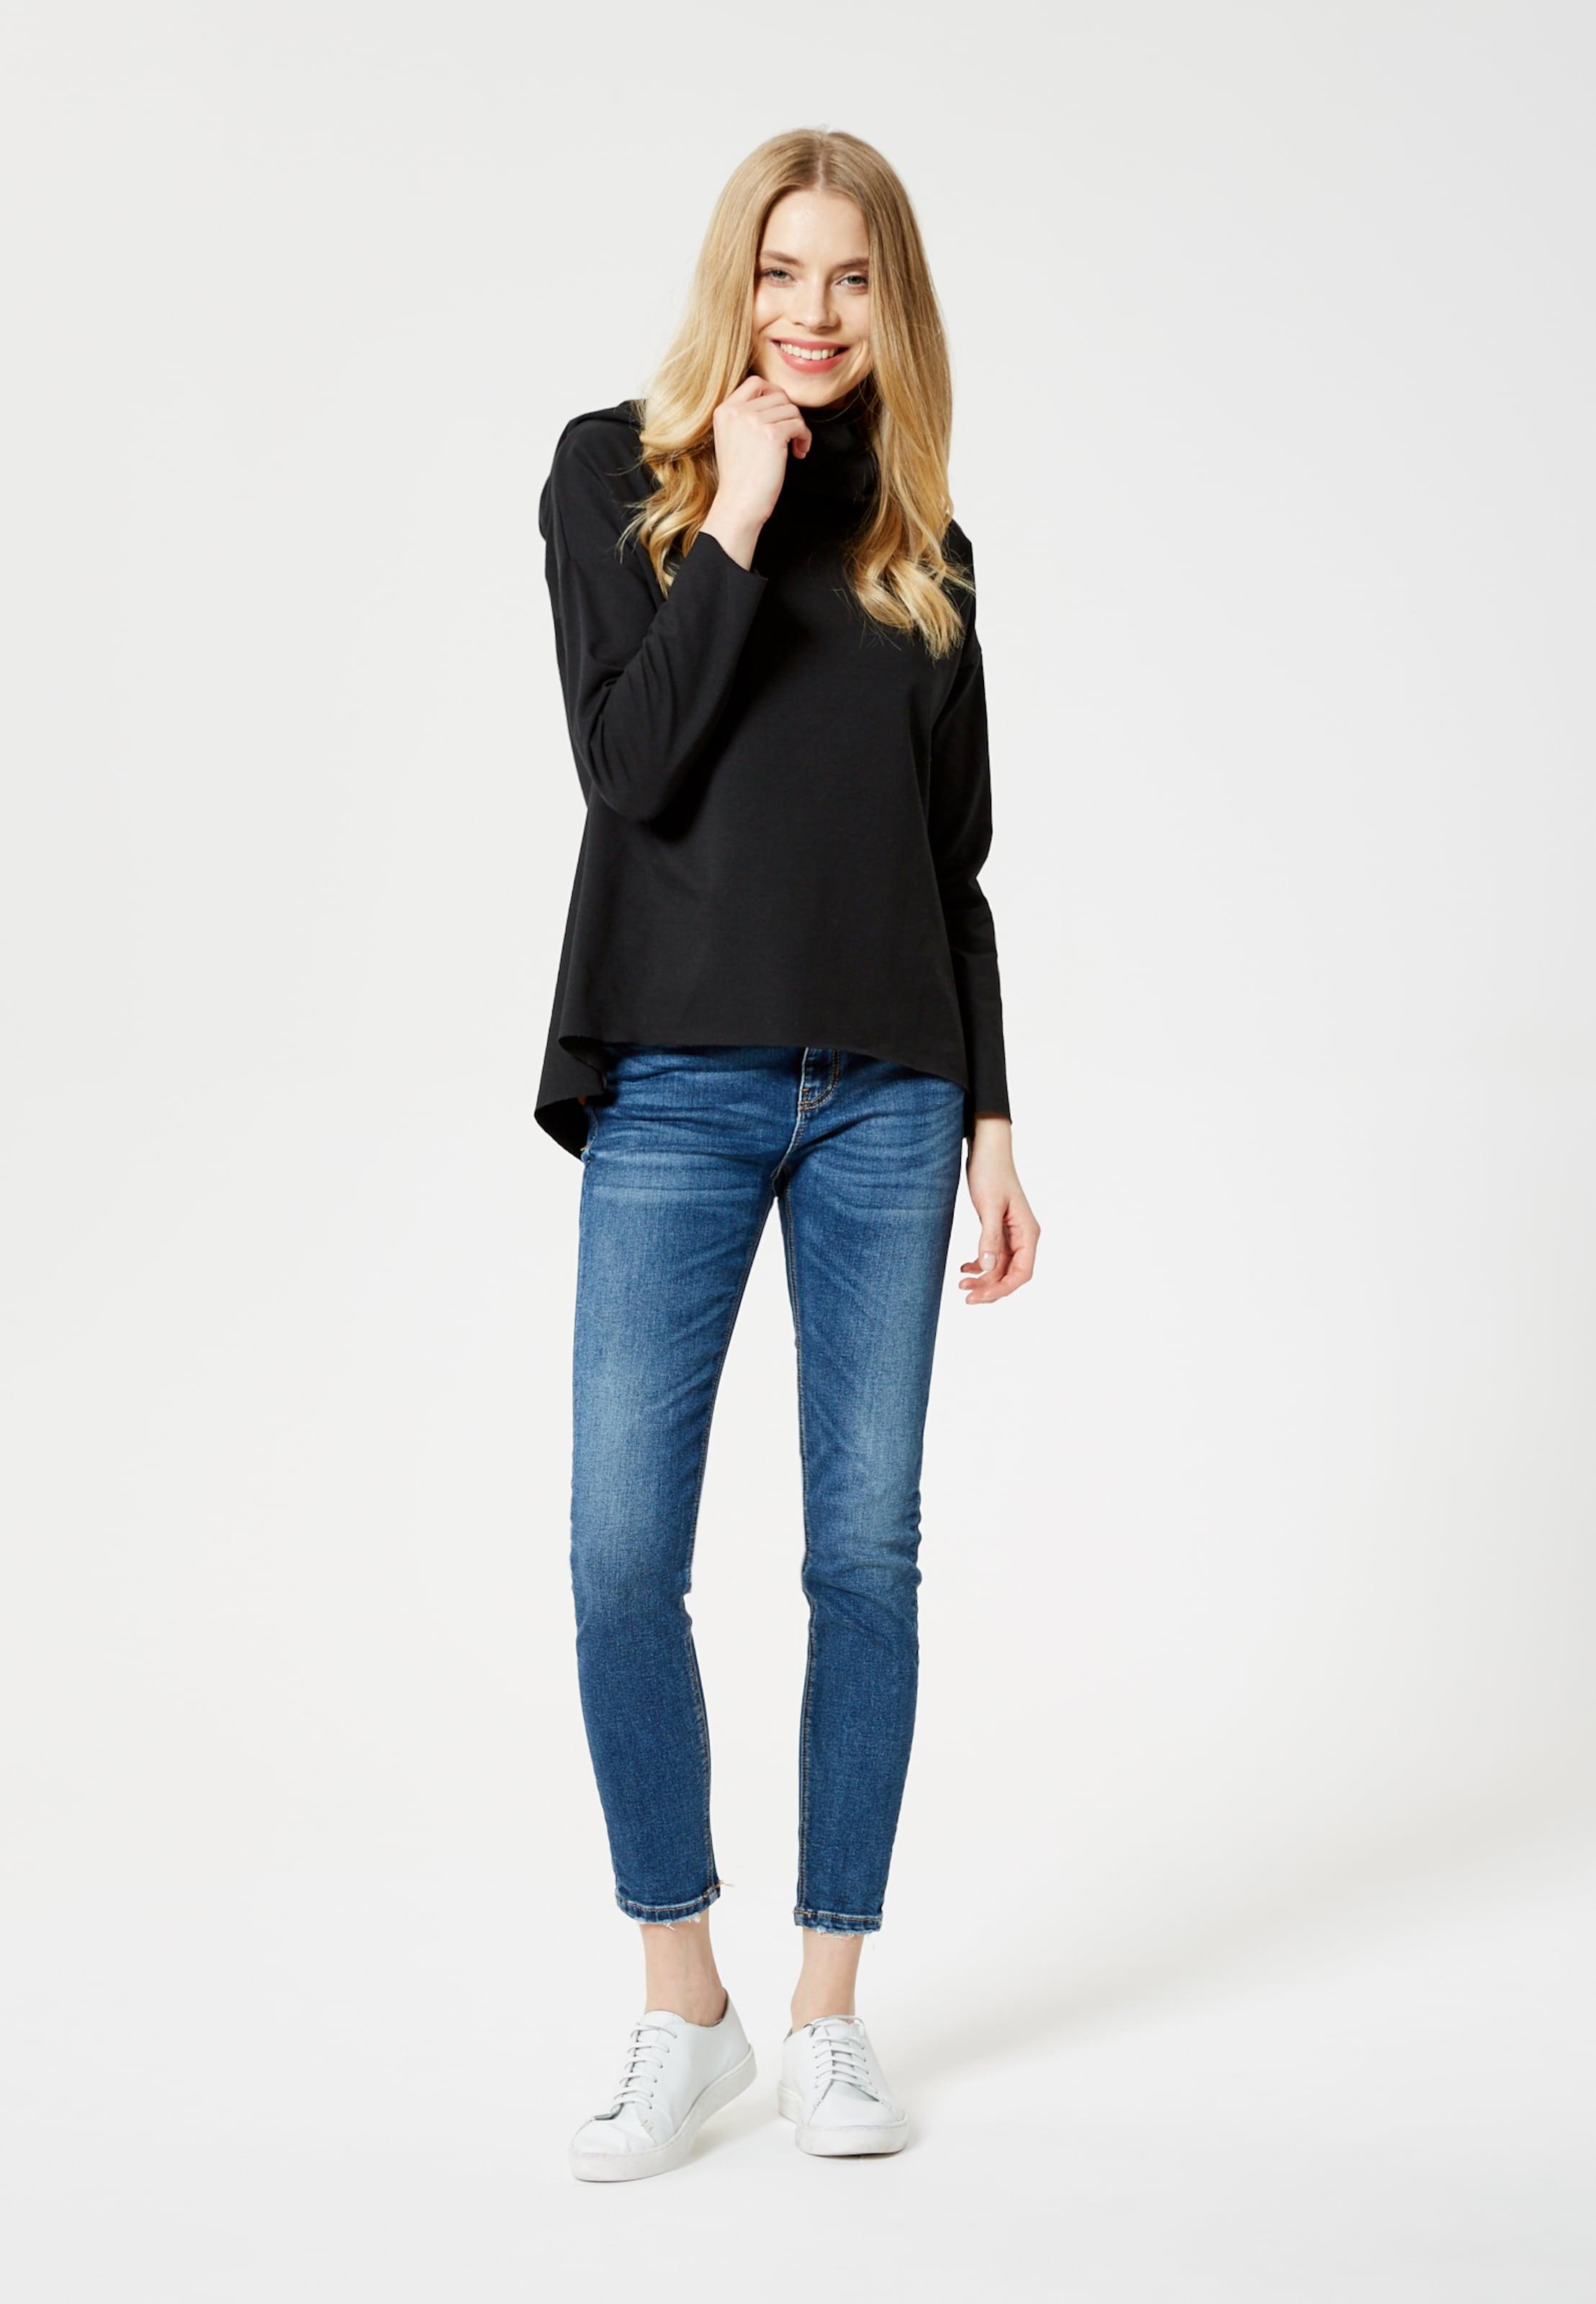 Sweater In Usha Schwarz Sweater Schwarz Usha Usha In Sweater Usha In Sweater Schwarz zqUMSVp